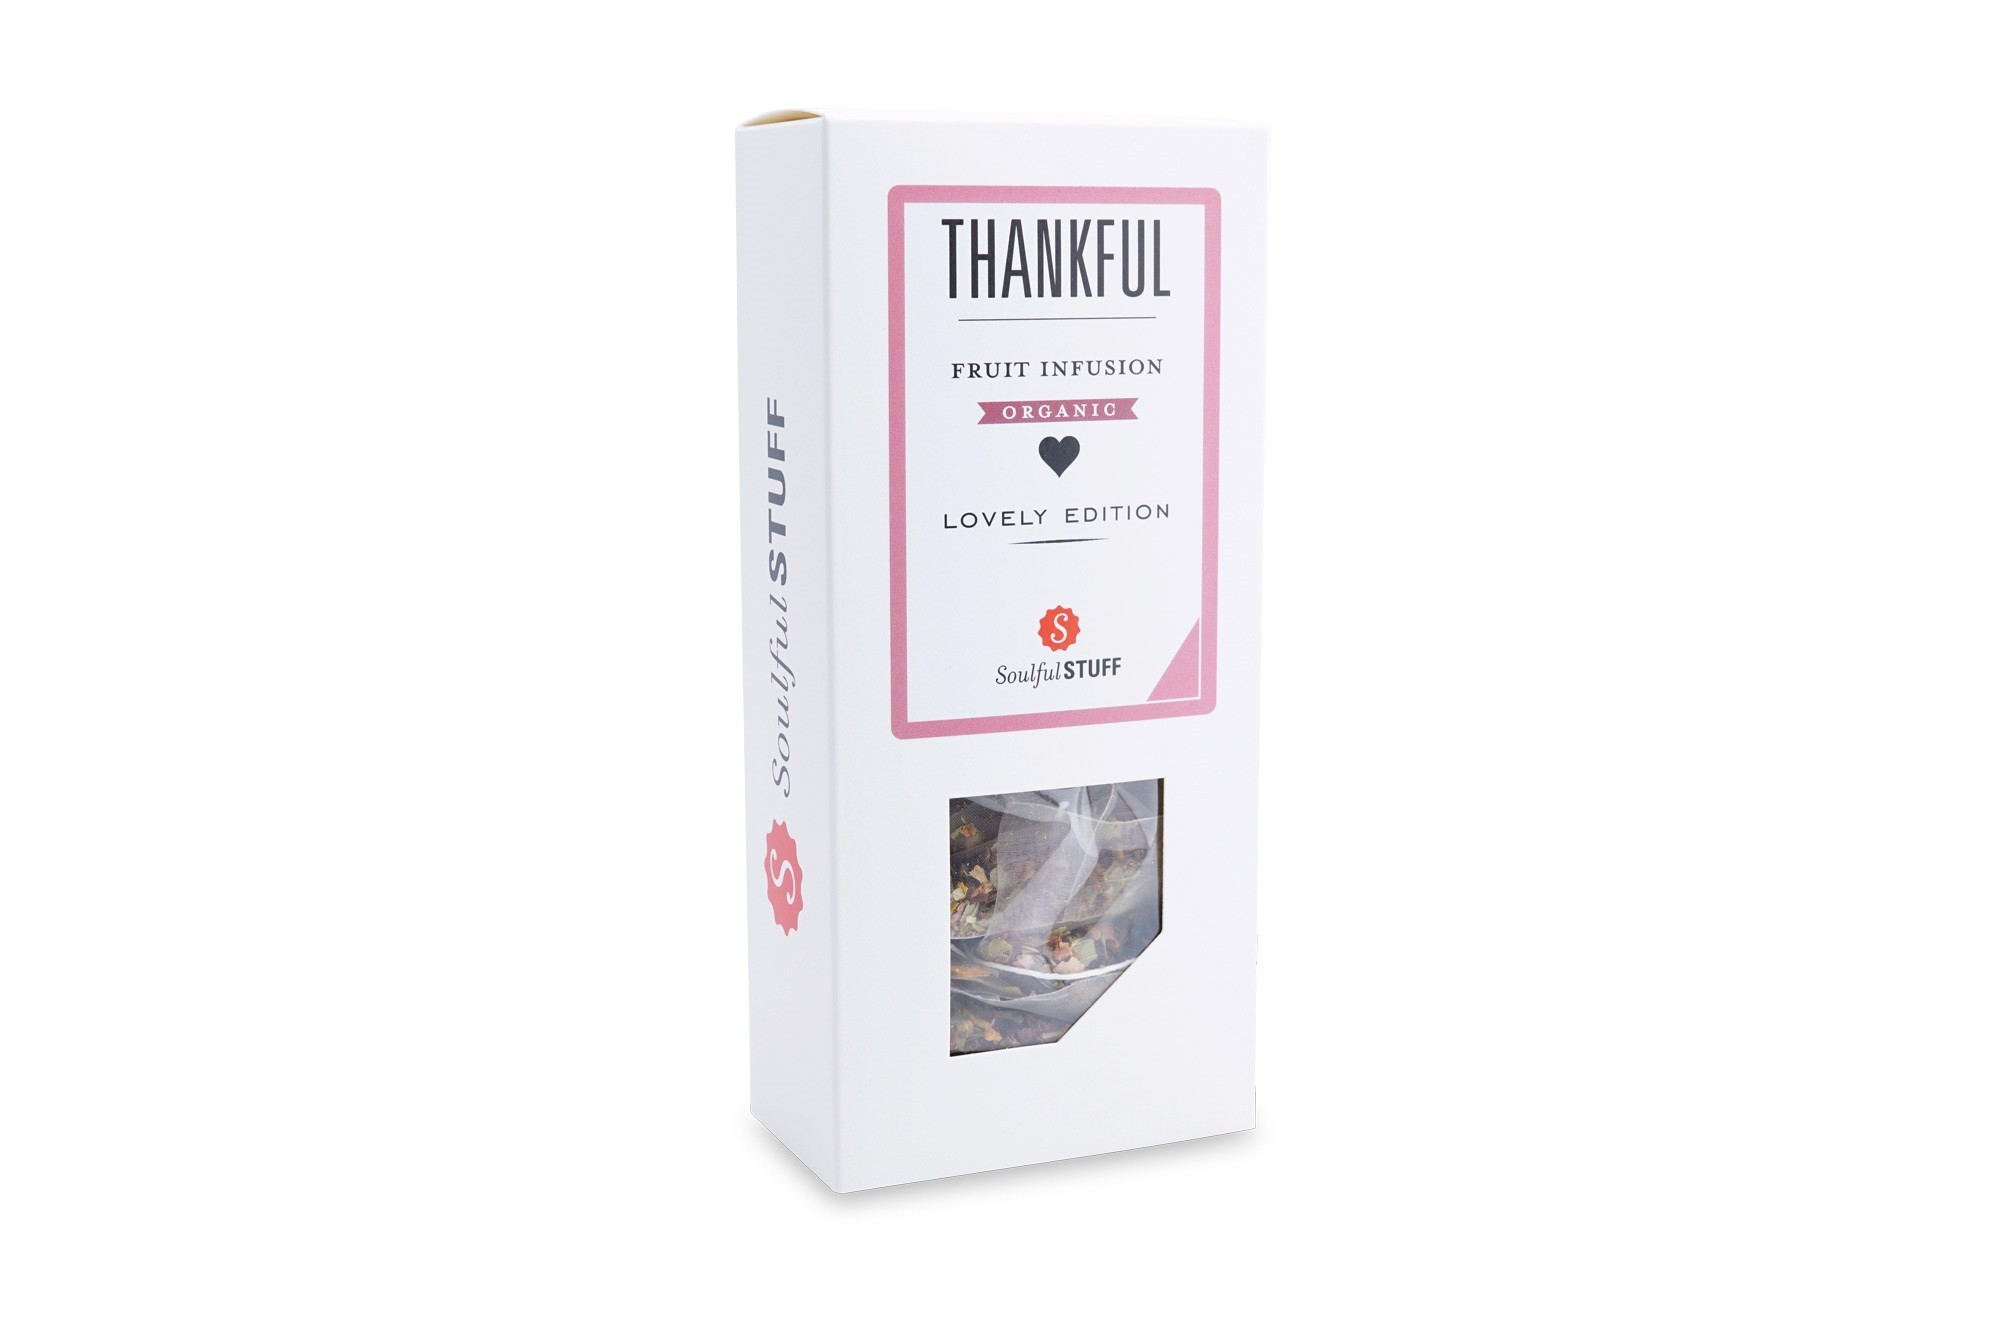 Thankful Fruit Infusion Organic zakjes 3gr. 15st. Intertee